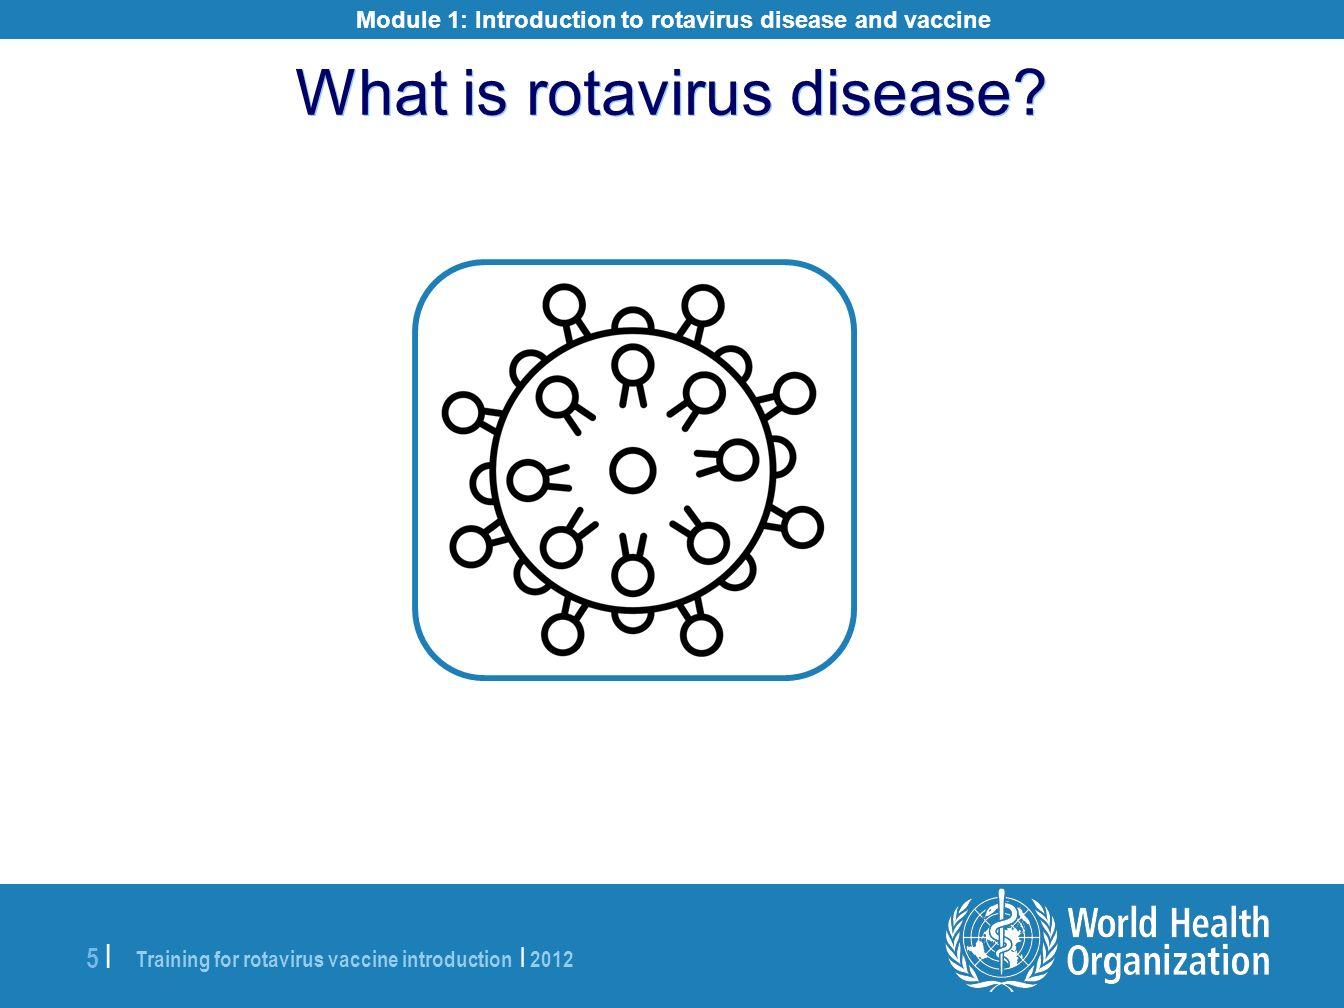 What is rotavirus disease